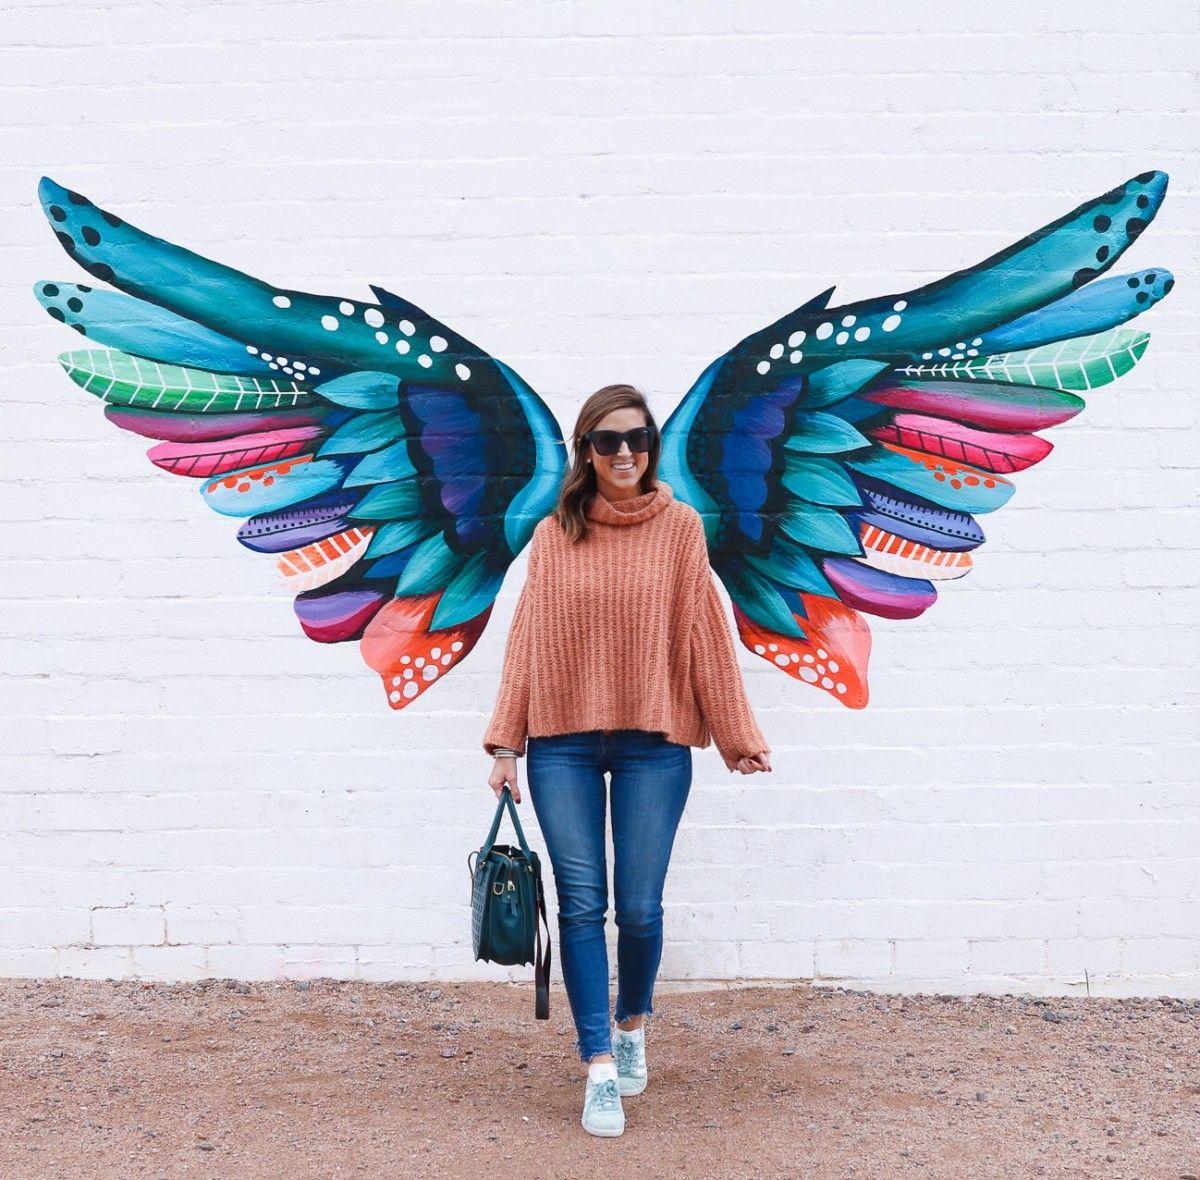 Murals In Phoenix Arizona Cobalt Chronicles Houston Travel Blogger Mural Wall Art Mural Angel Wings Art